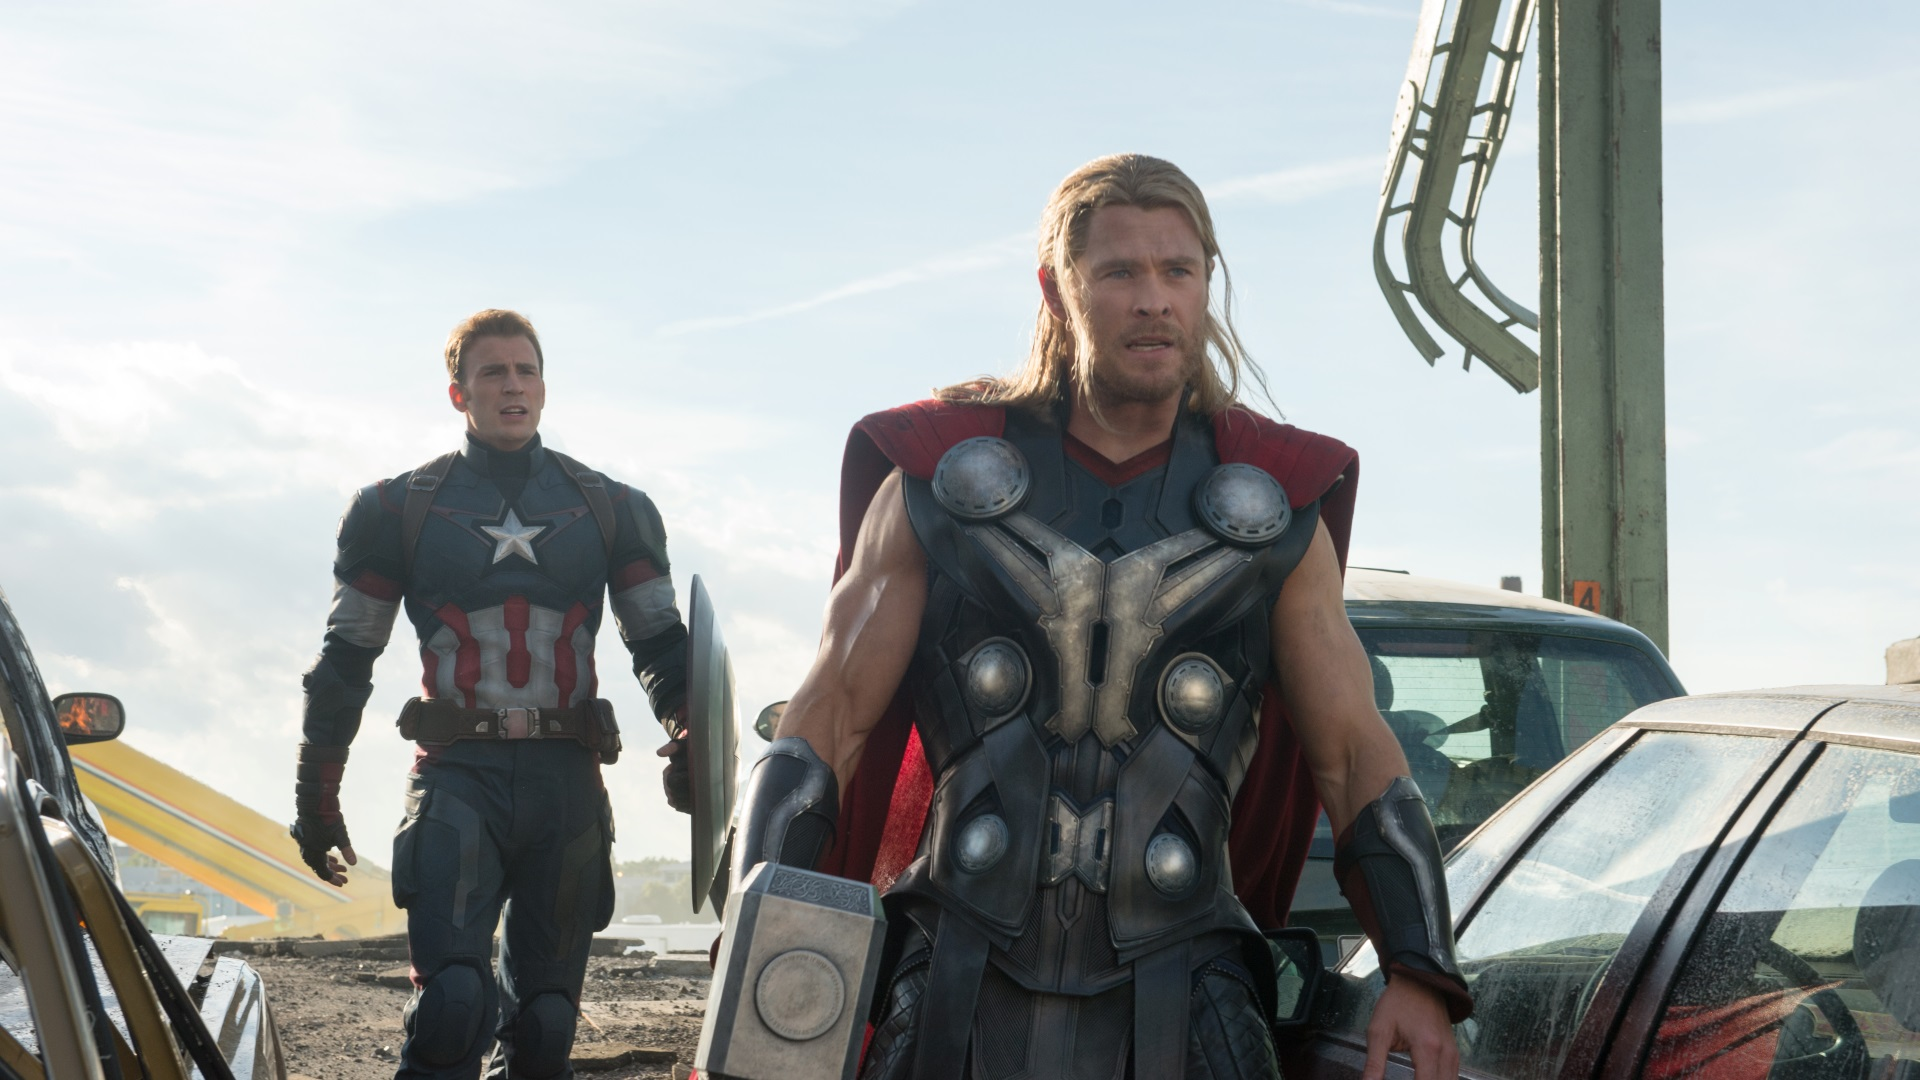 Avengers Age Of Ultron 2015 Review Robert Downey Jr Chris Hemsworth Chris Evans